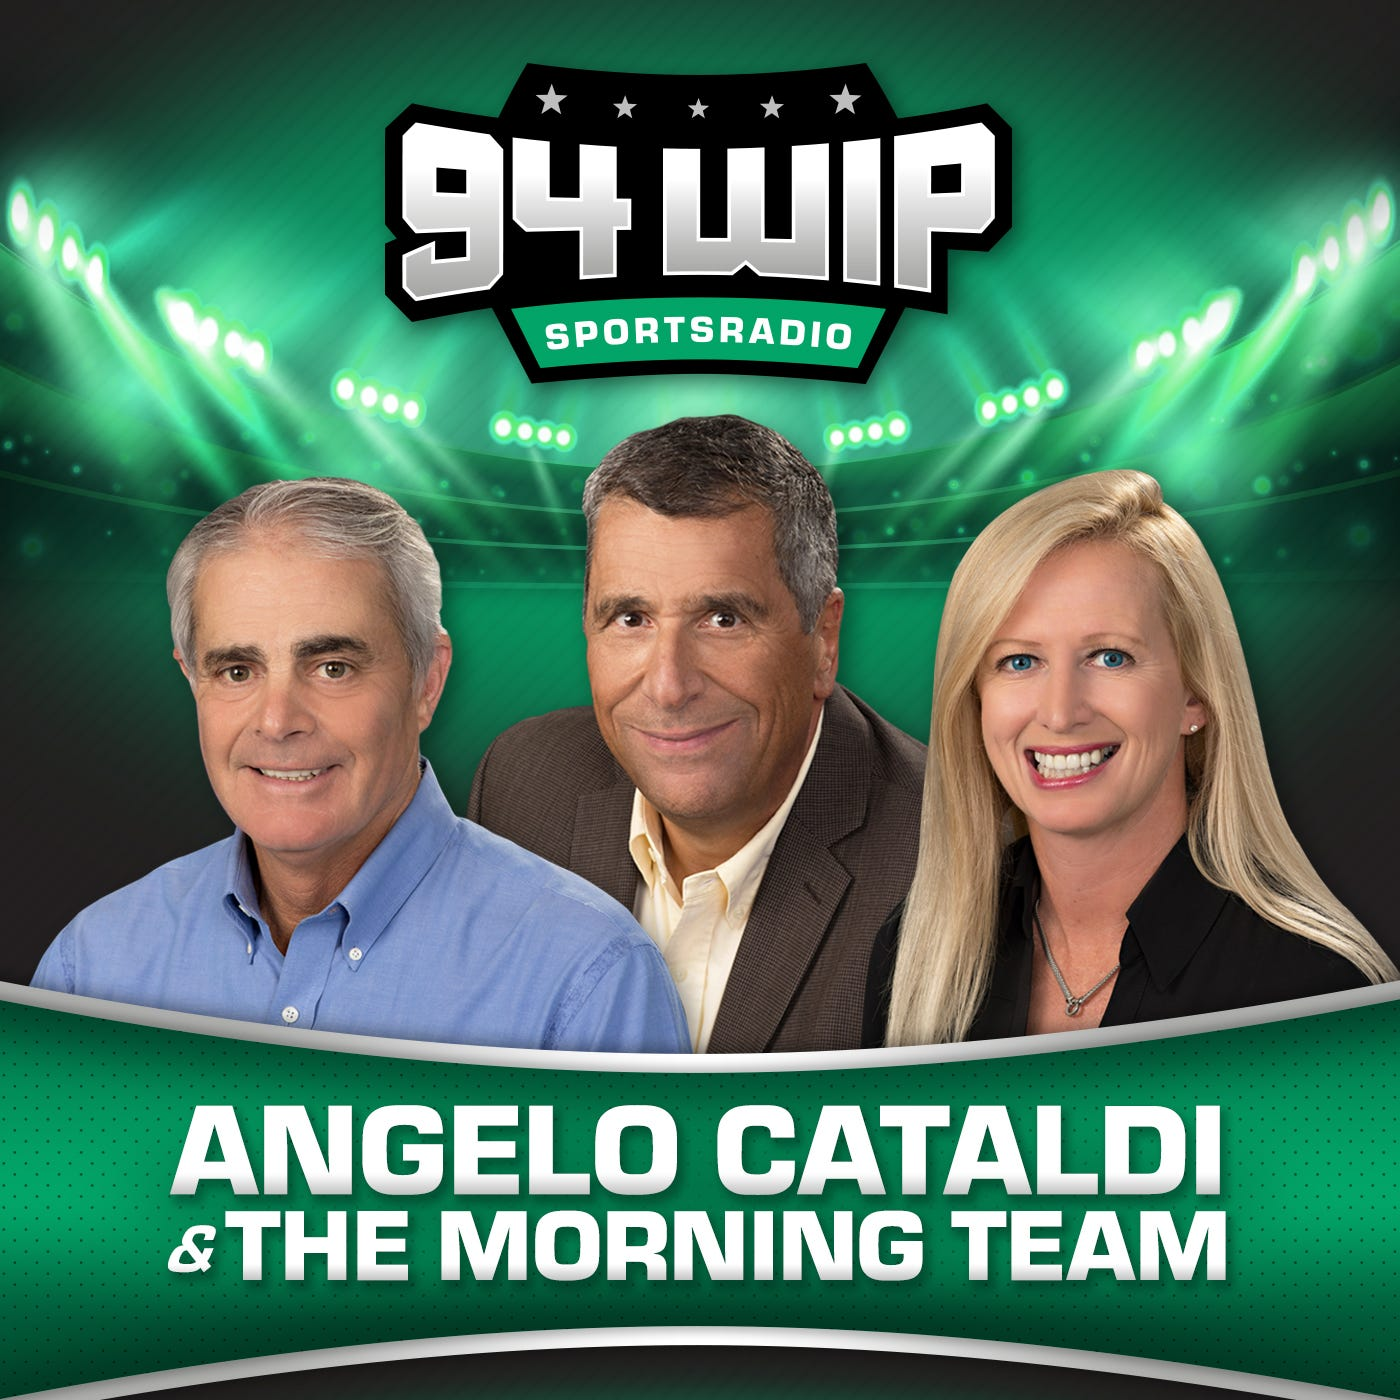 SportsRadio 94WIP on Radio com: Listen to Free Radio Online   Music